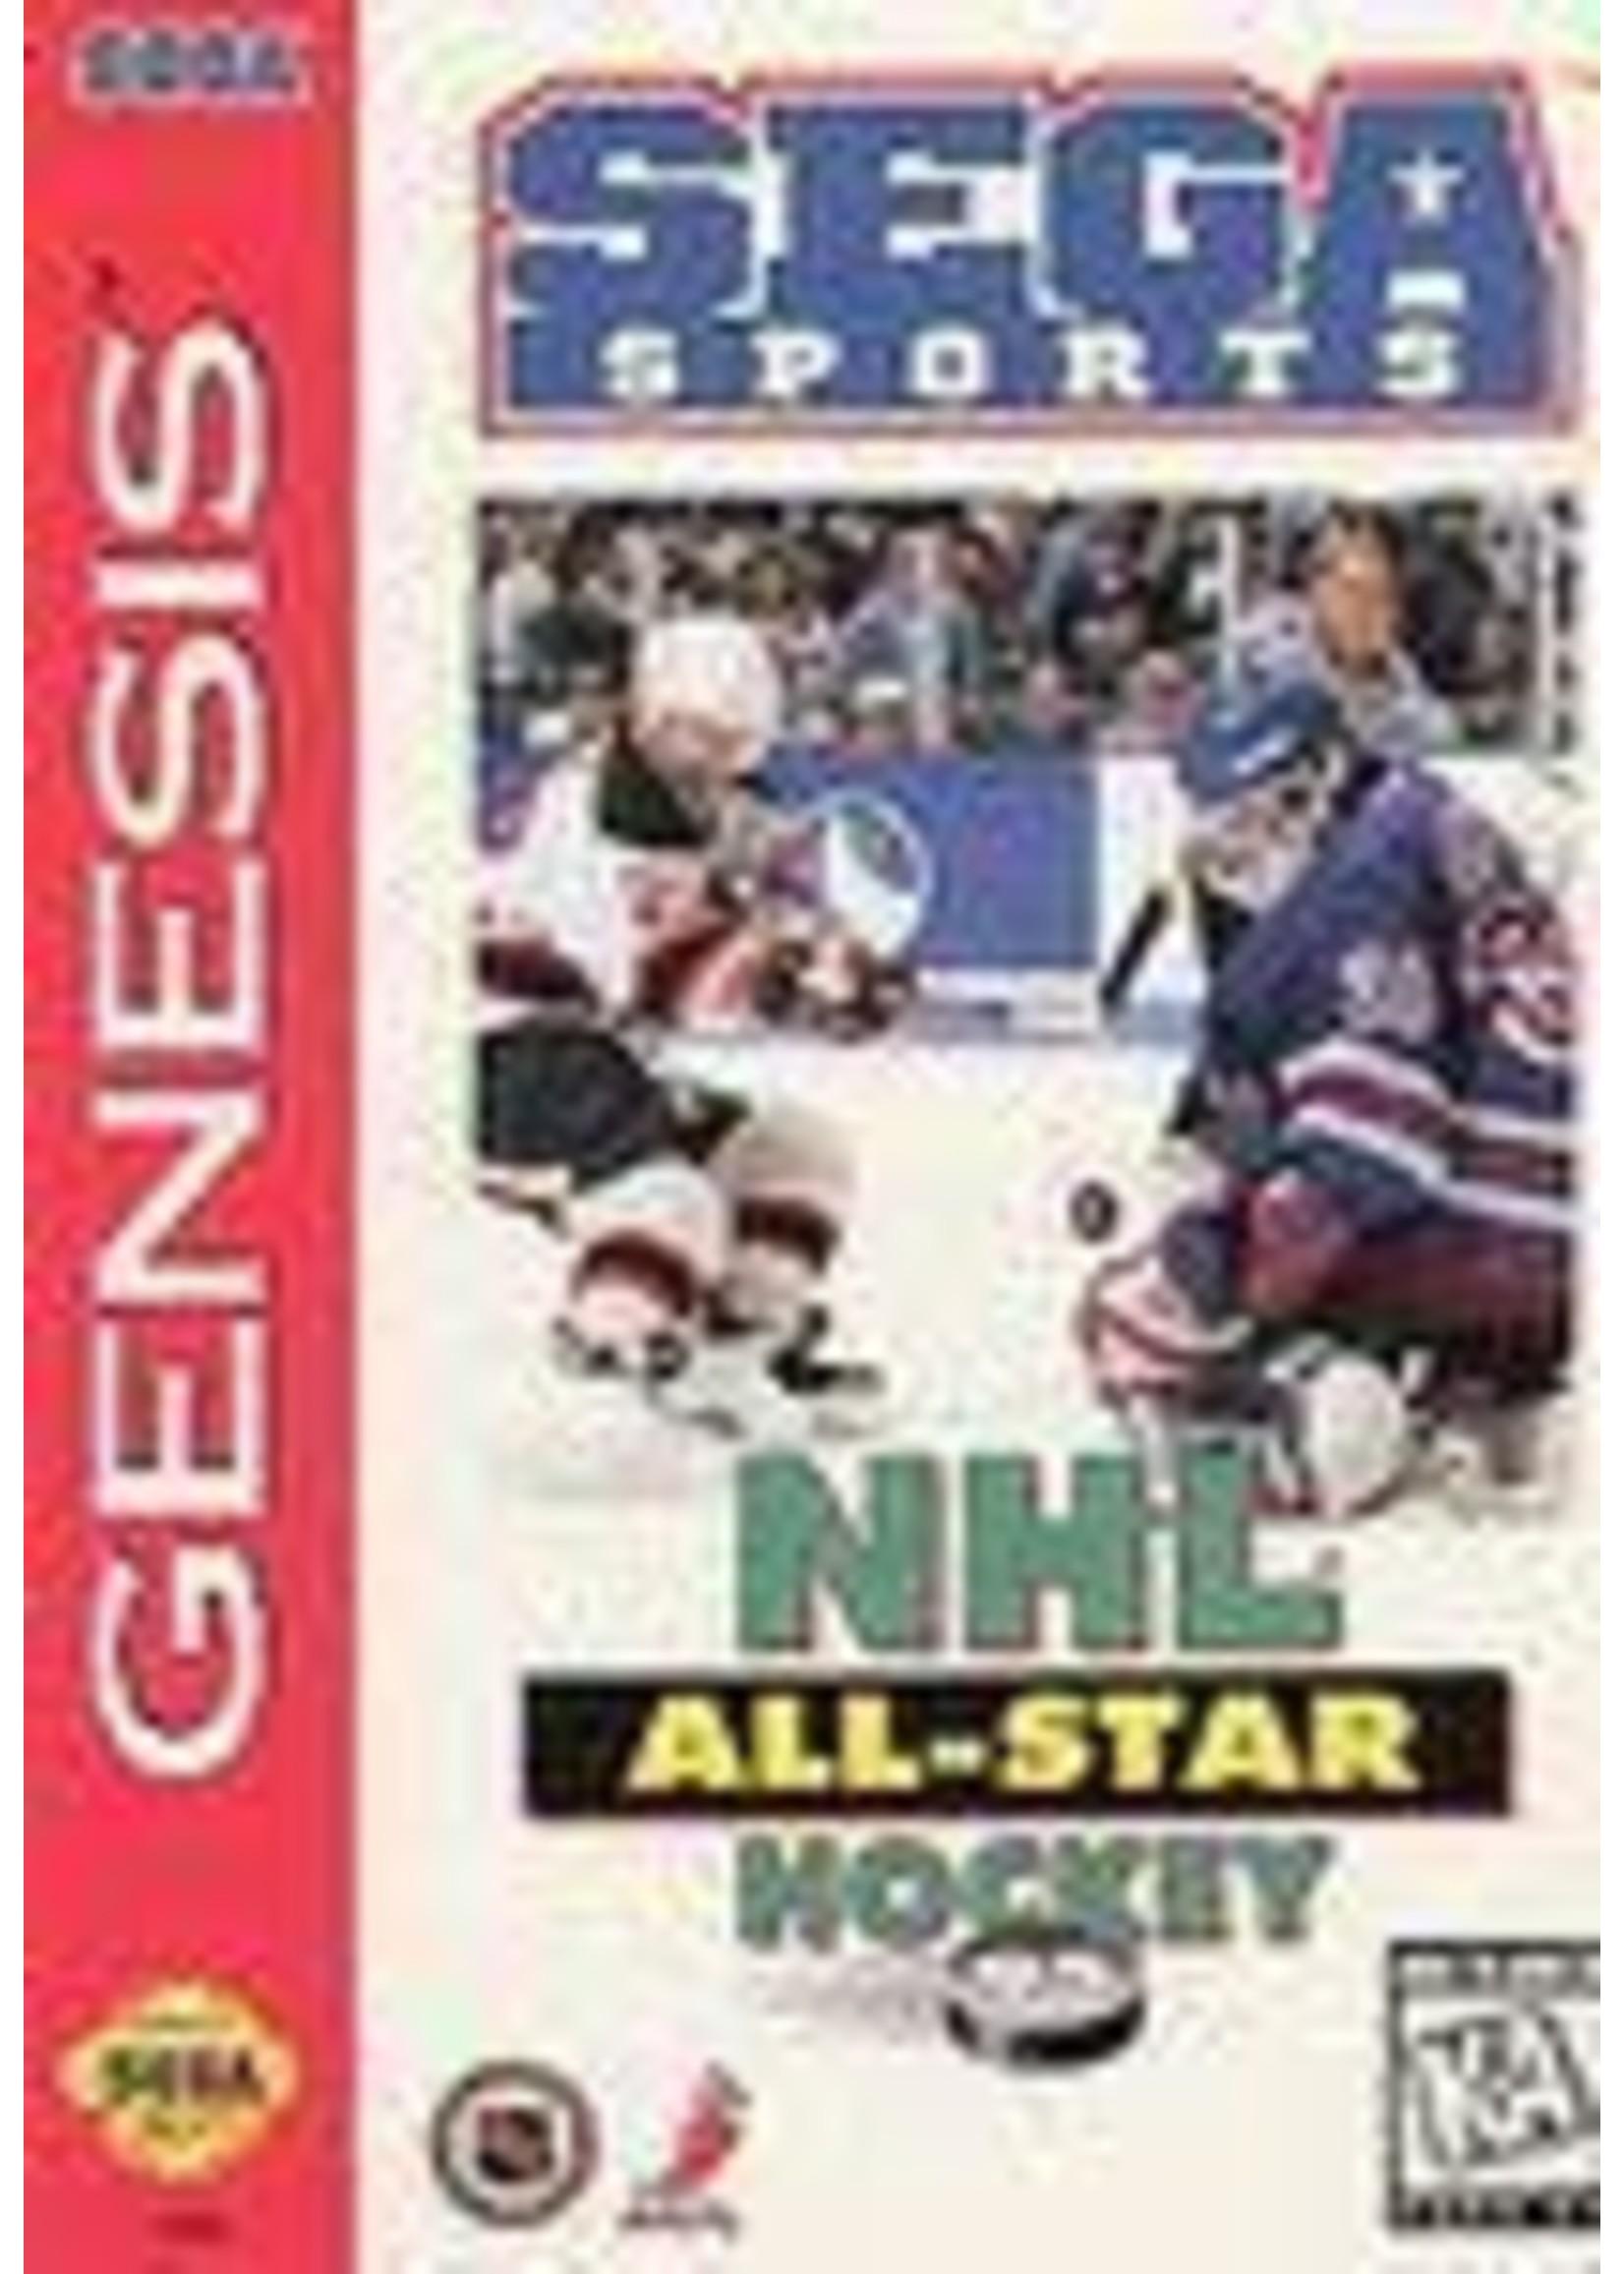 NHL All-Star Hockey 95 Sega Genesis